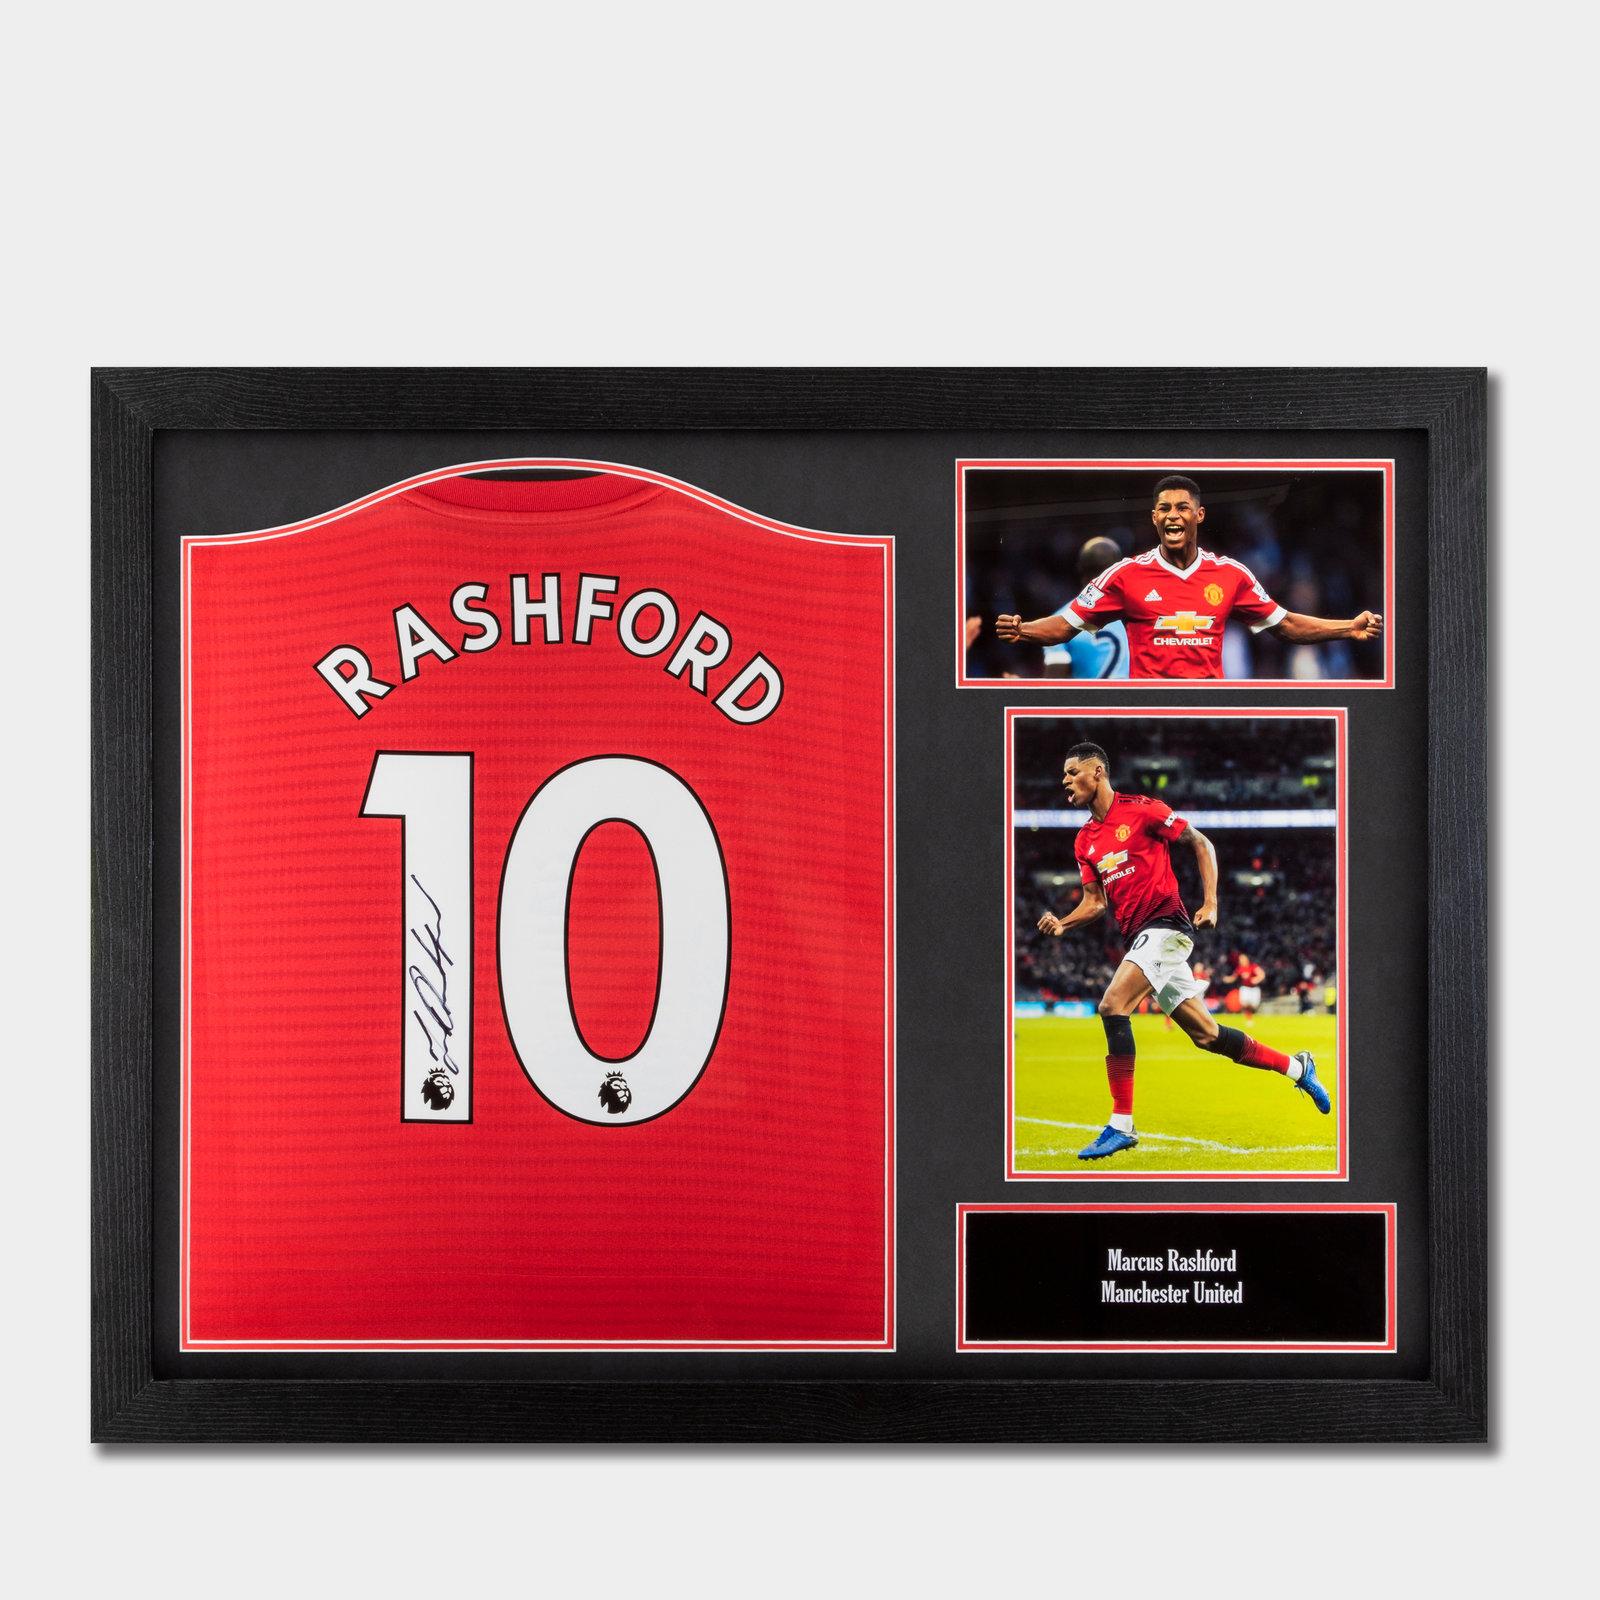 Marcus Rashford 18/19 Signed Framed Football Shirt